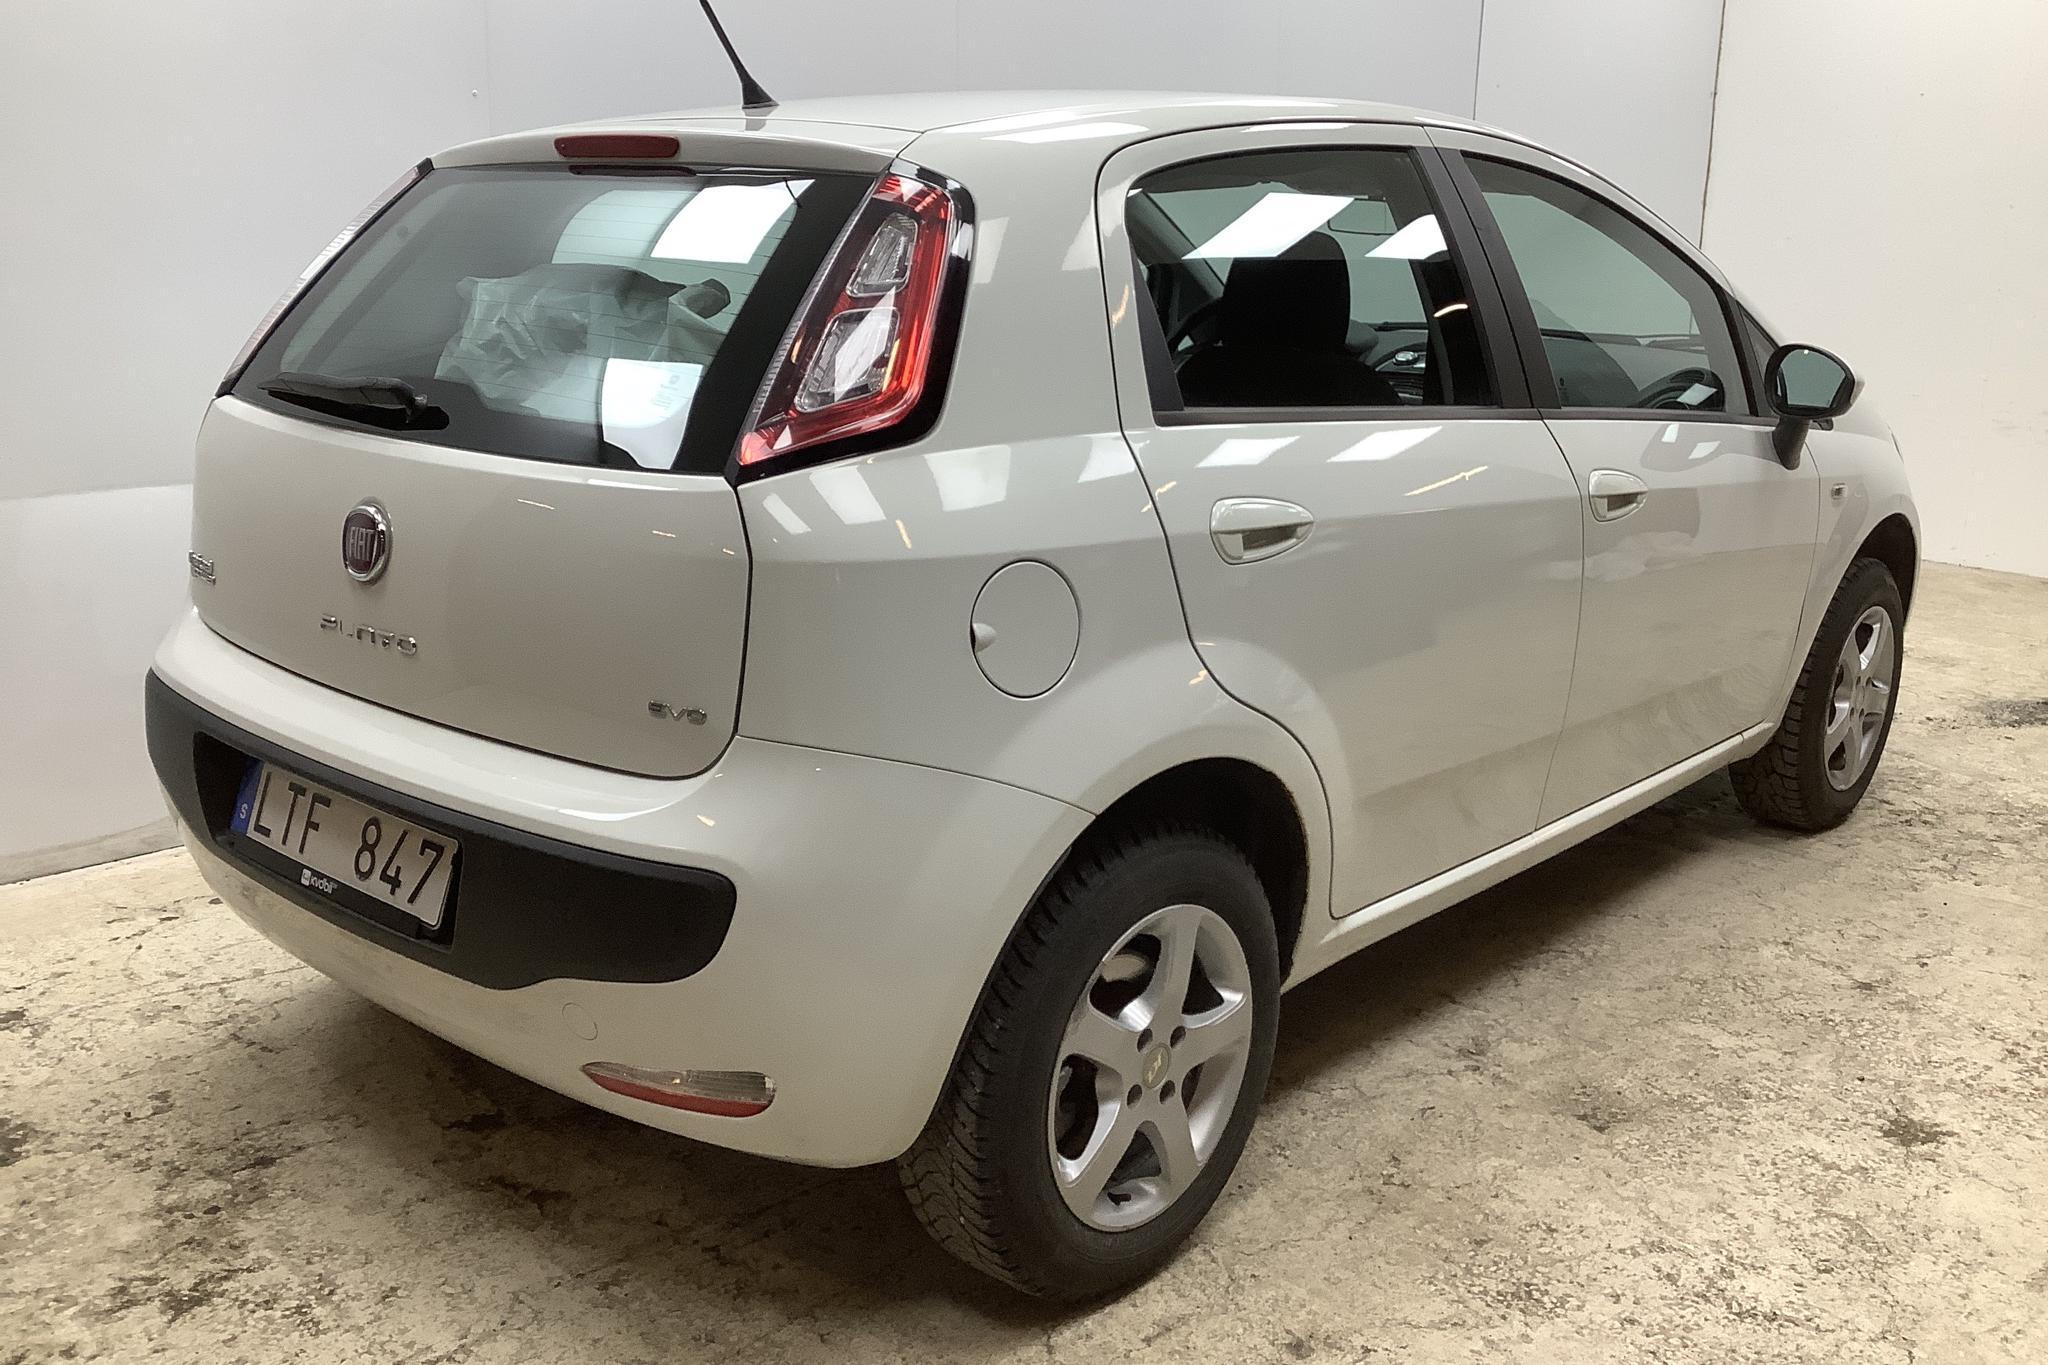 Fiat Punto Evo 1.4 Biogas 5dr (77hk) - 13 195 mil - Manuell - vit - 2011